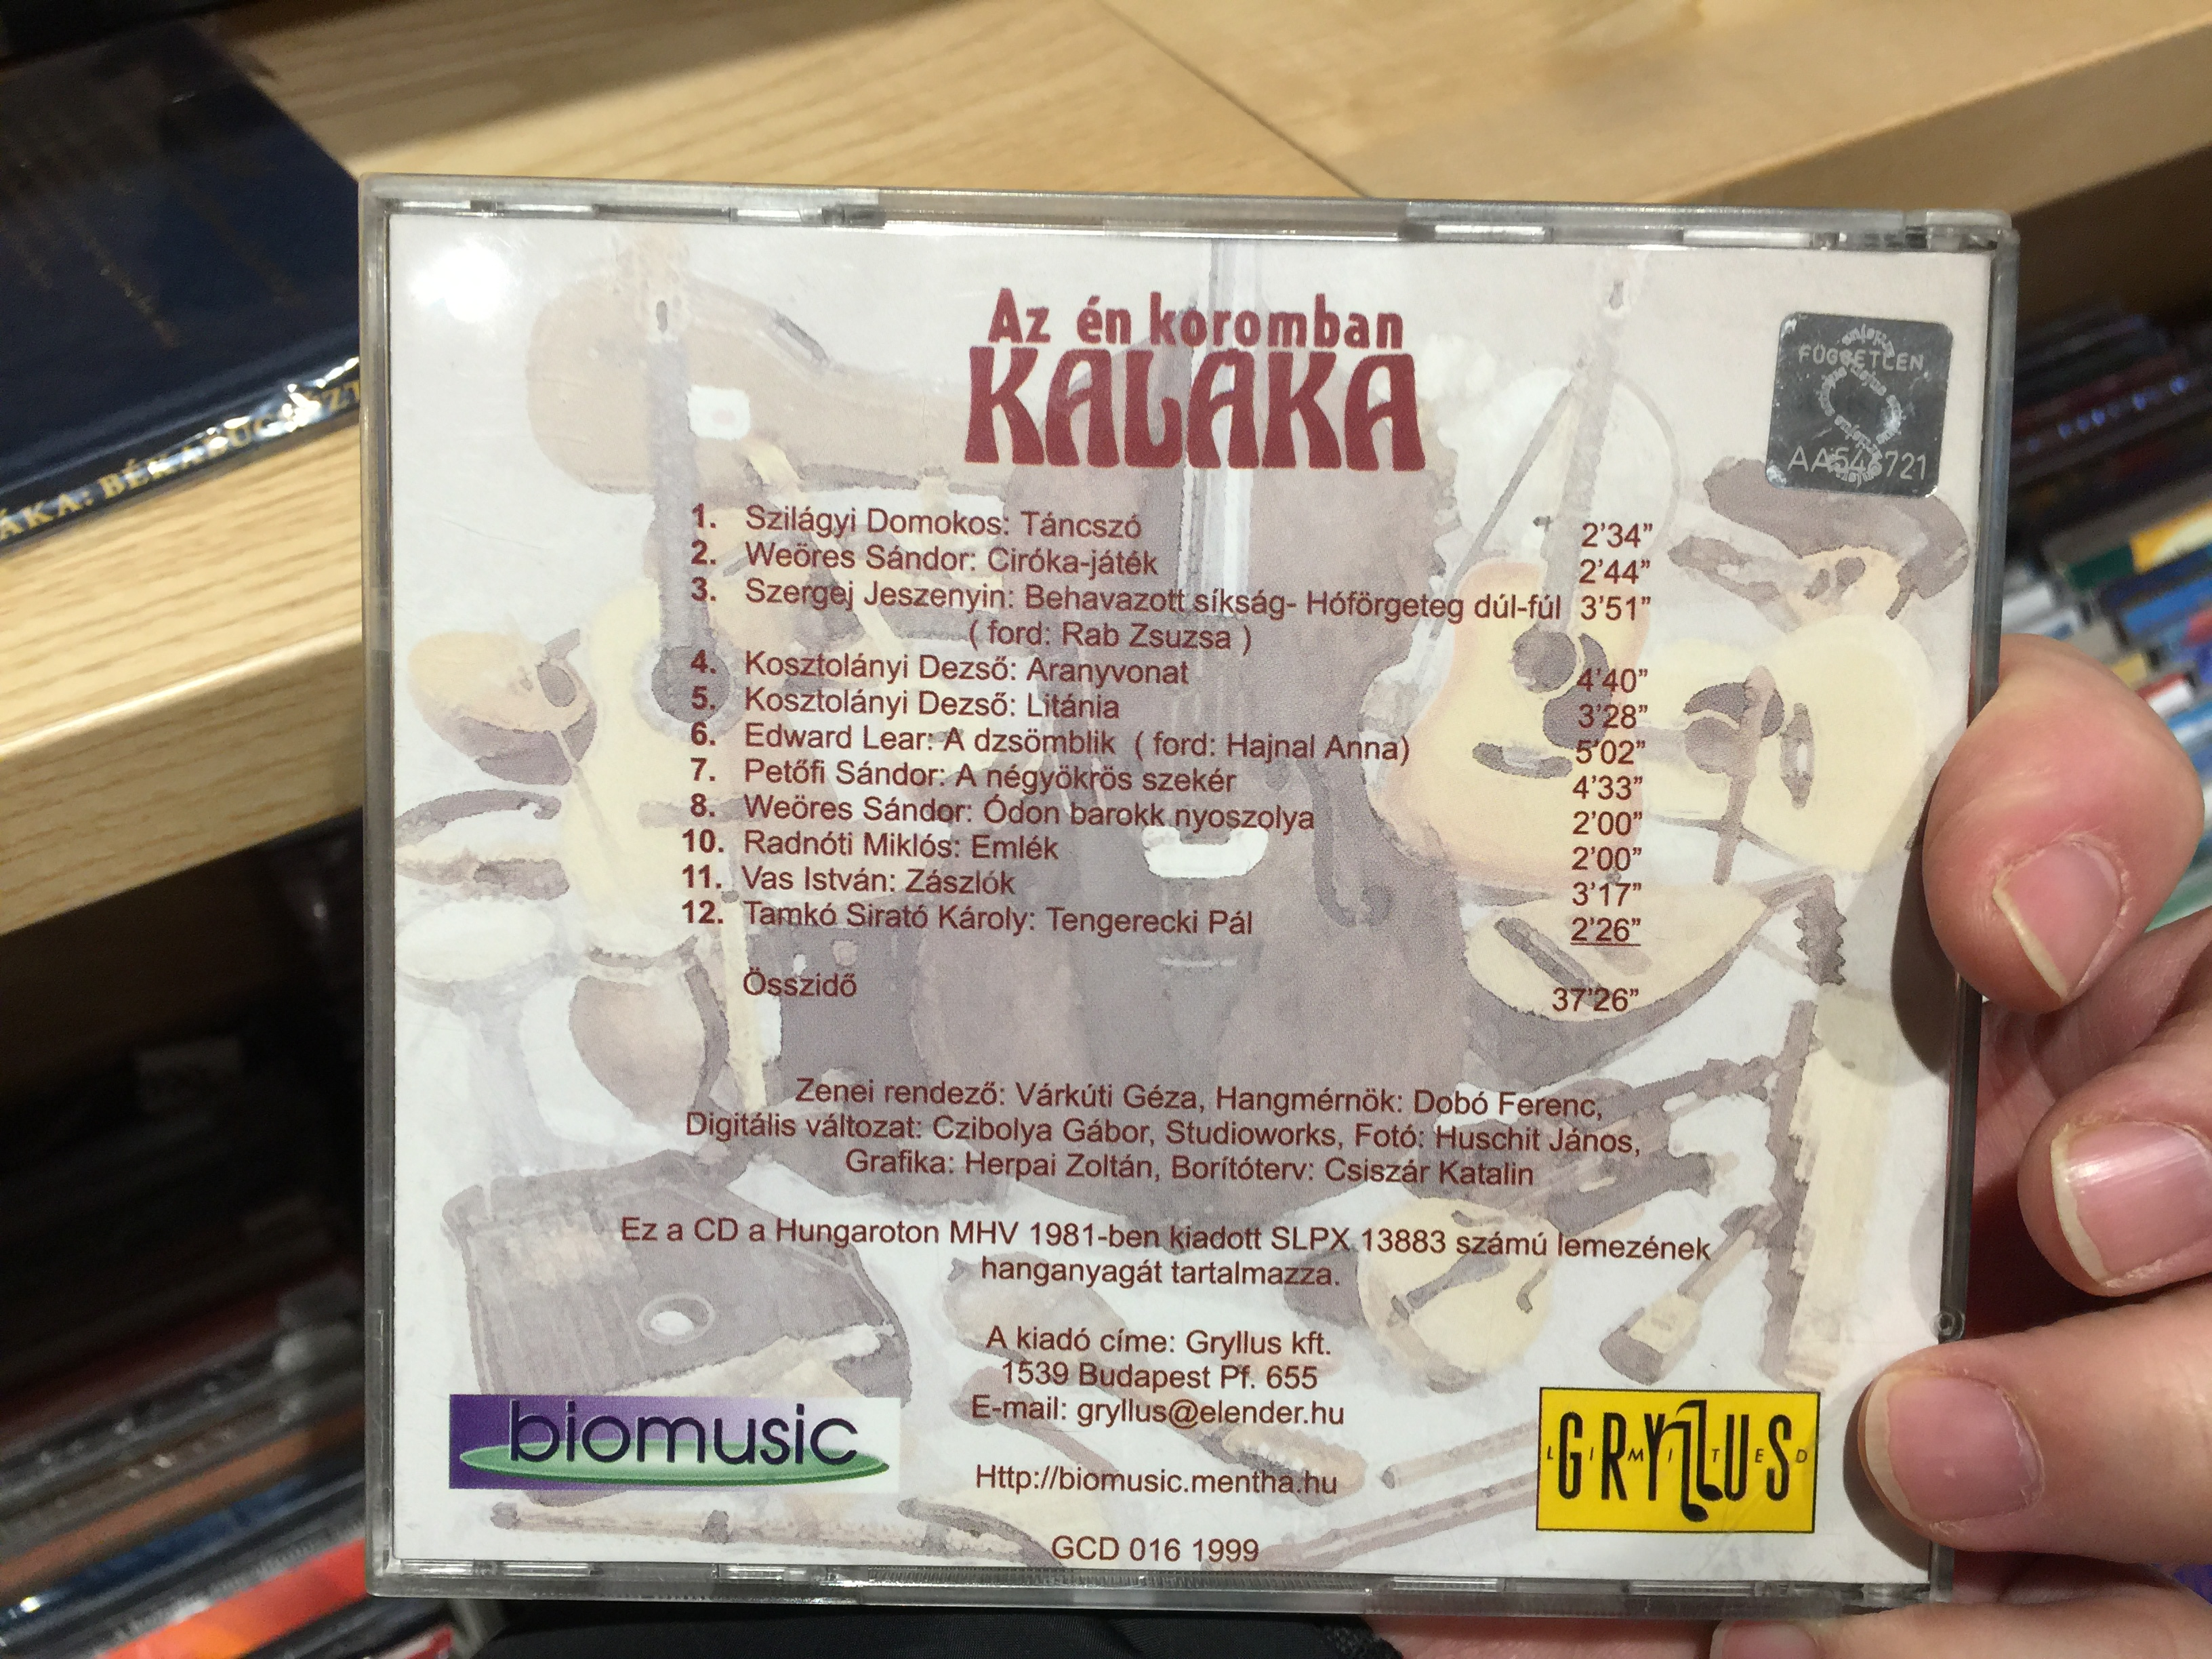 kal-ka-az-n-koromban-gryllus-audio-cd-1999-gcd-016-2-.jpg